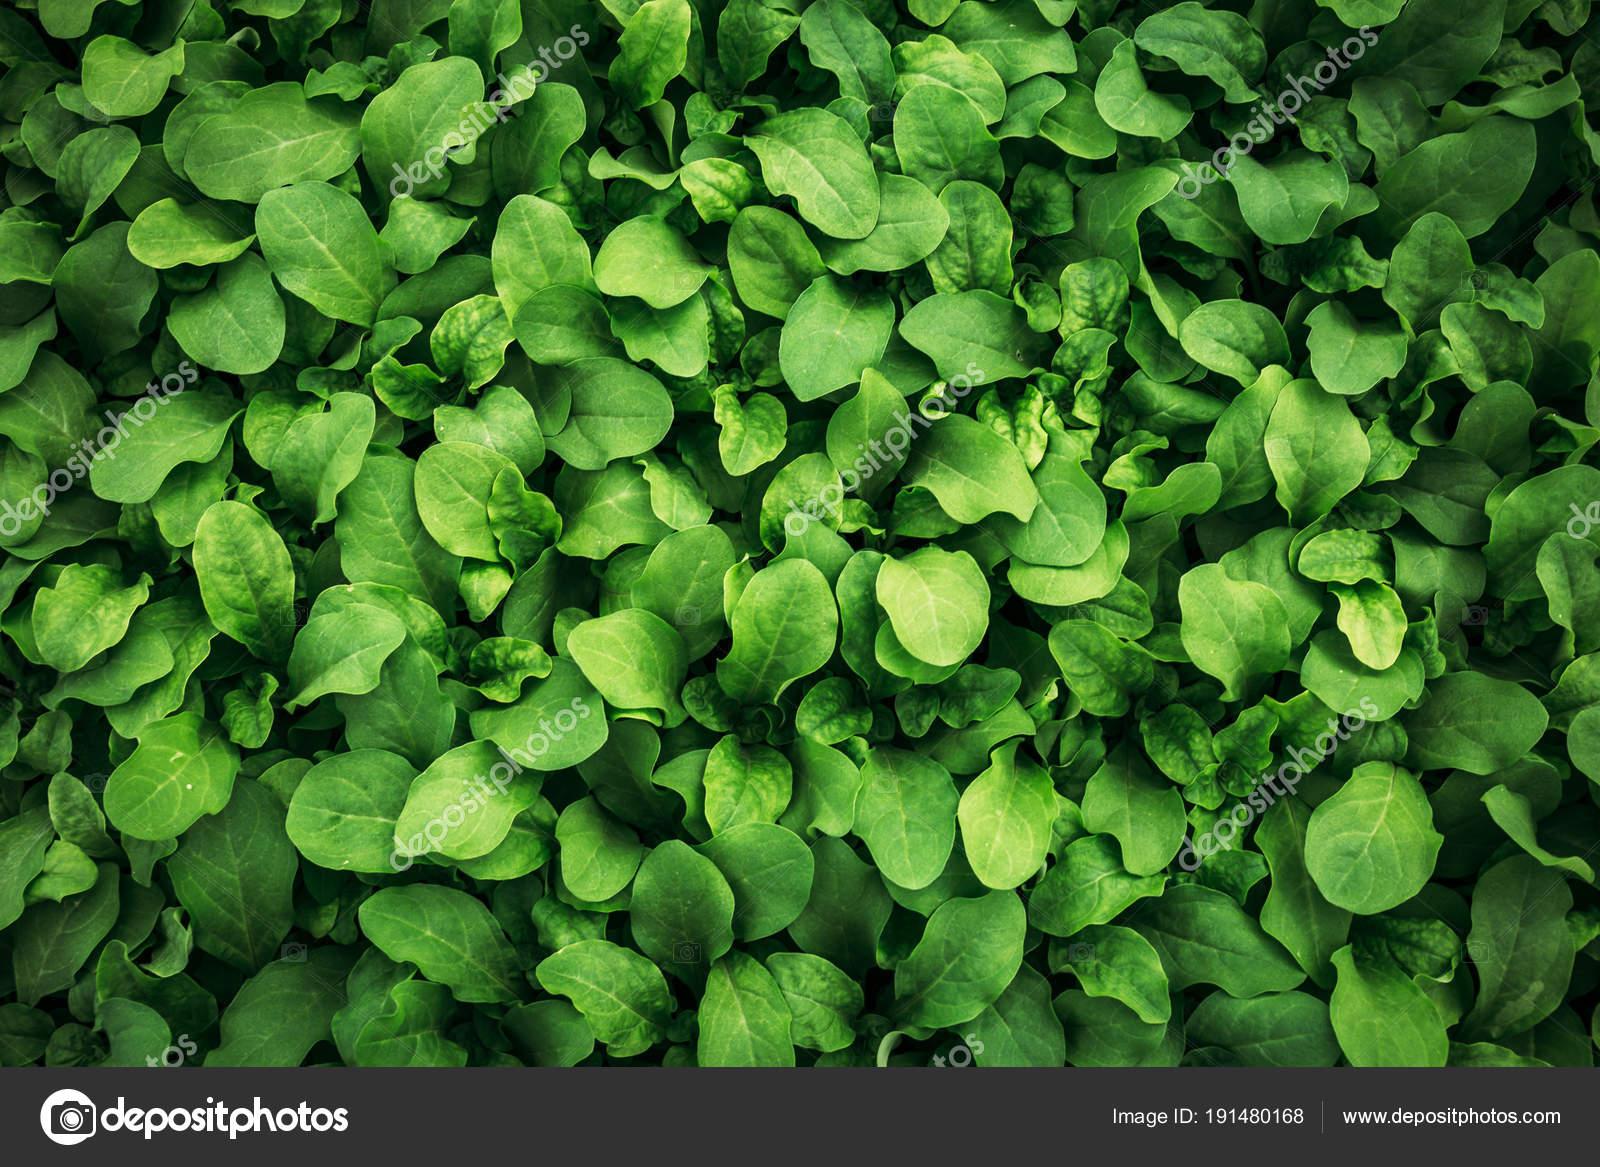 Arriere Plan De Feuille Verte Blanc Feuilles Petunia Texture Photo